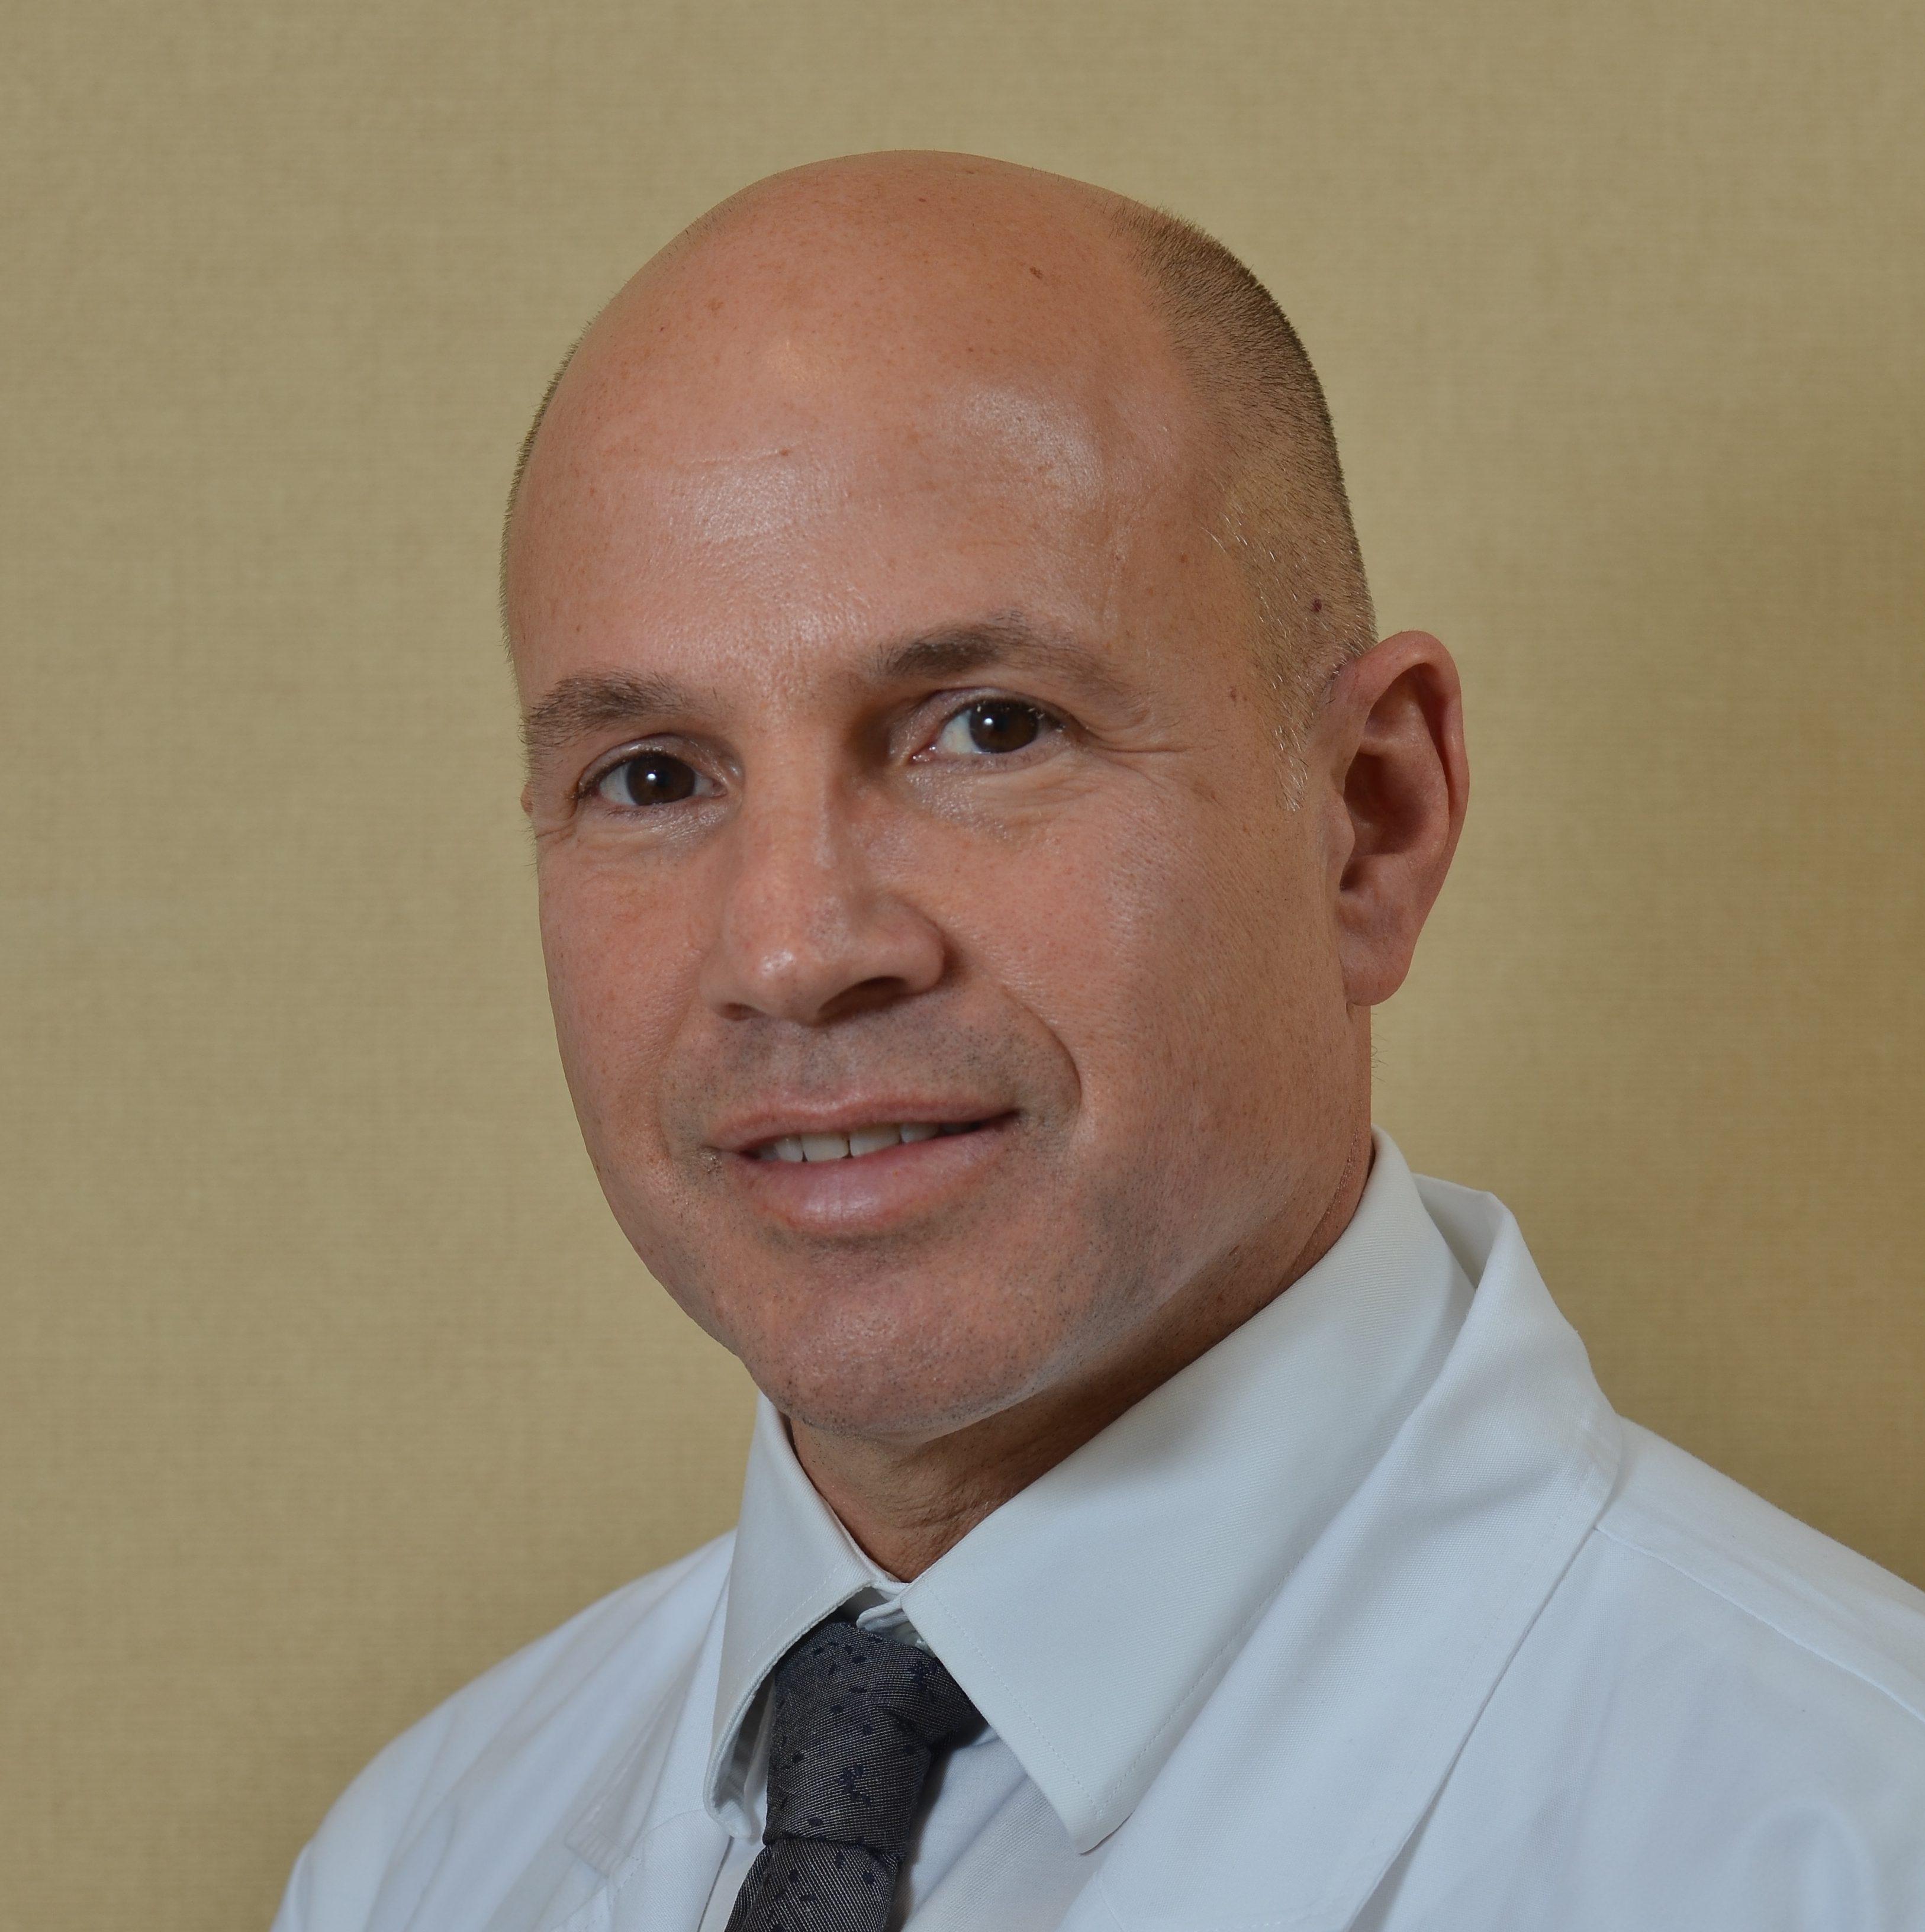 Craig Wilkenfeld MD, FACC